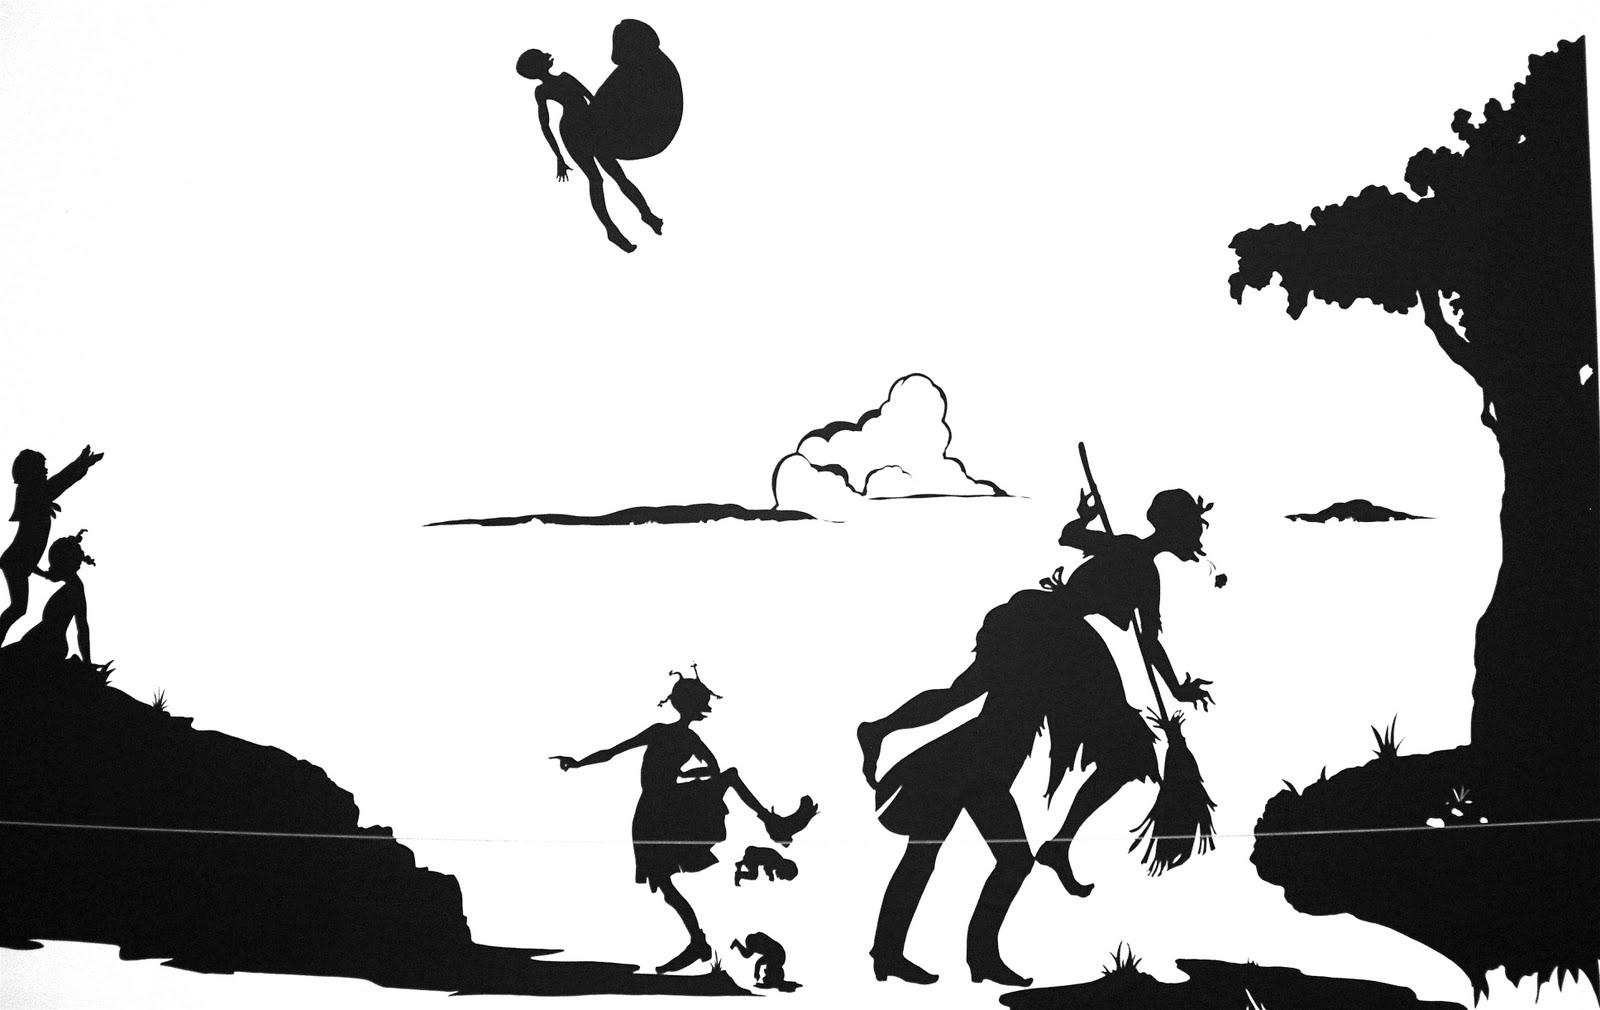 Kara walker silhouettes